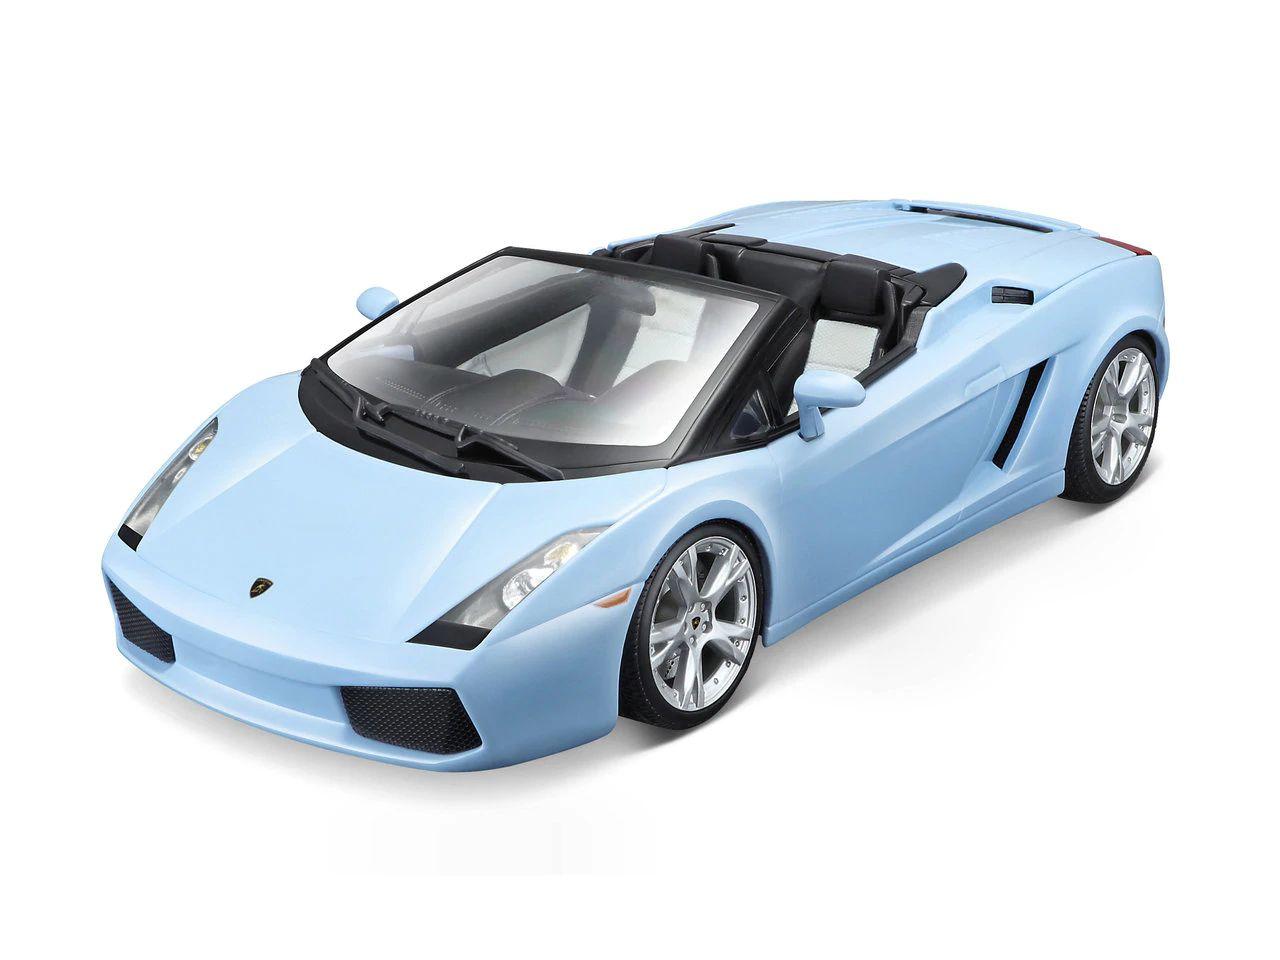 Miniatura Lamborghini Gallardo Spyder 1/18 Maisto